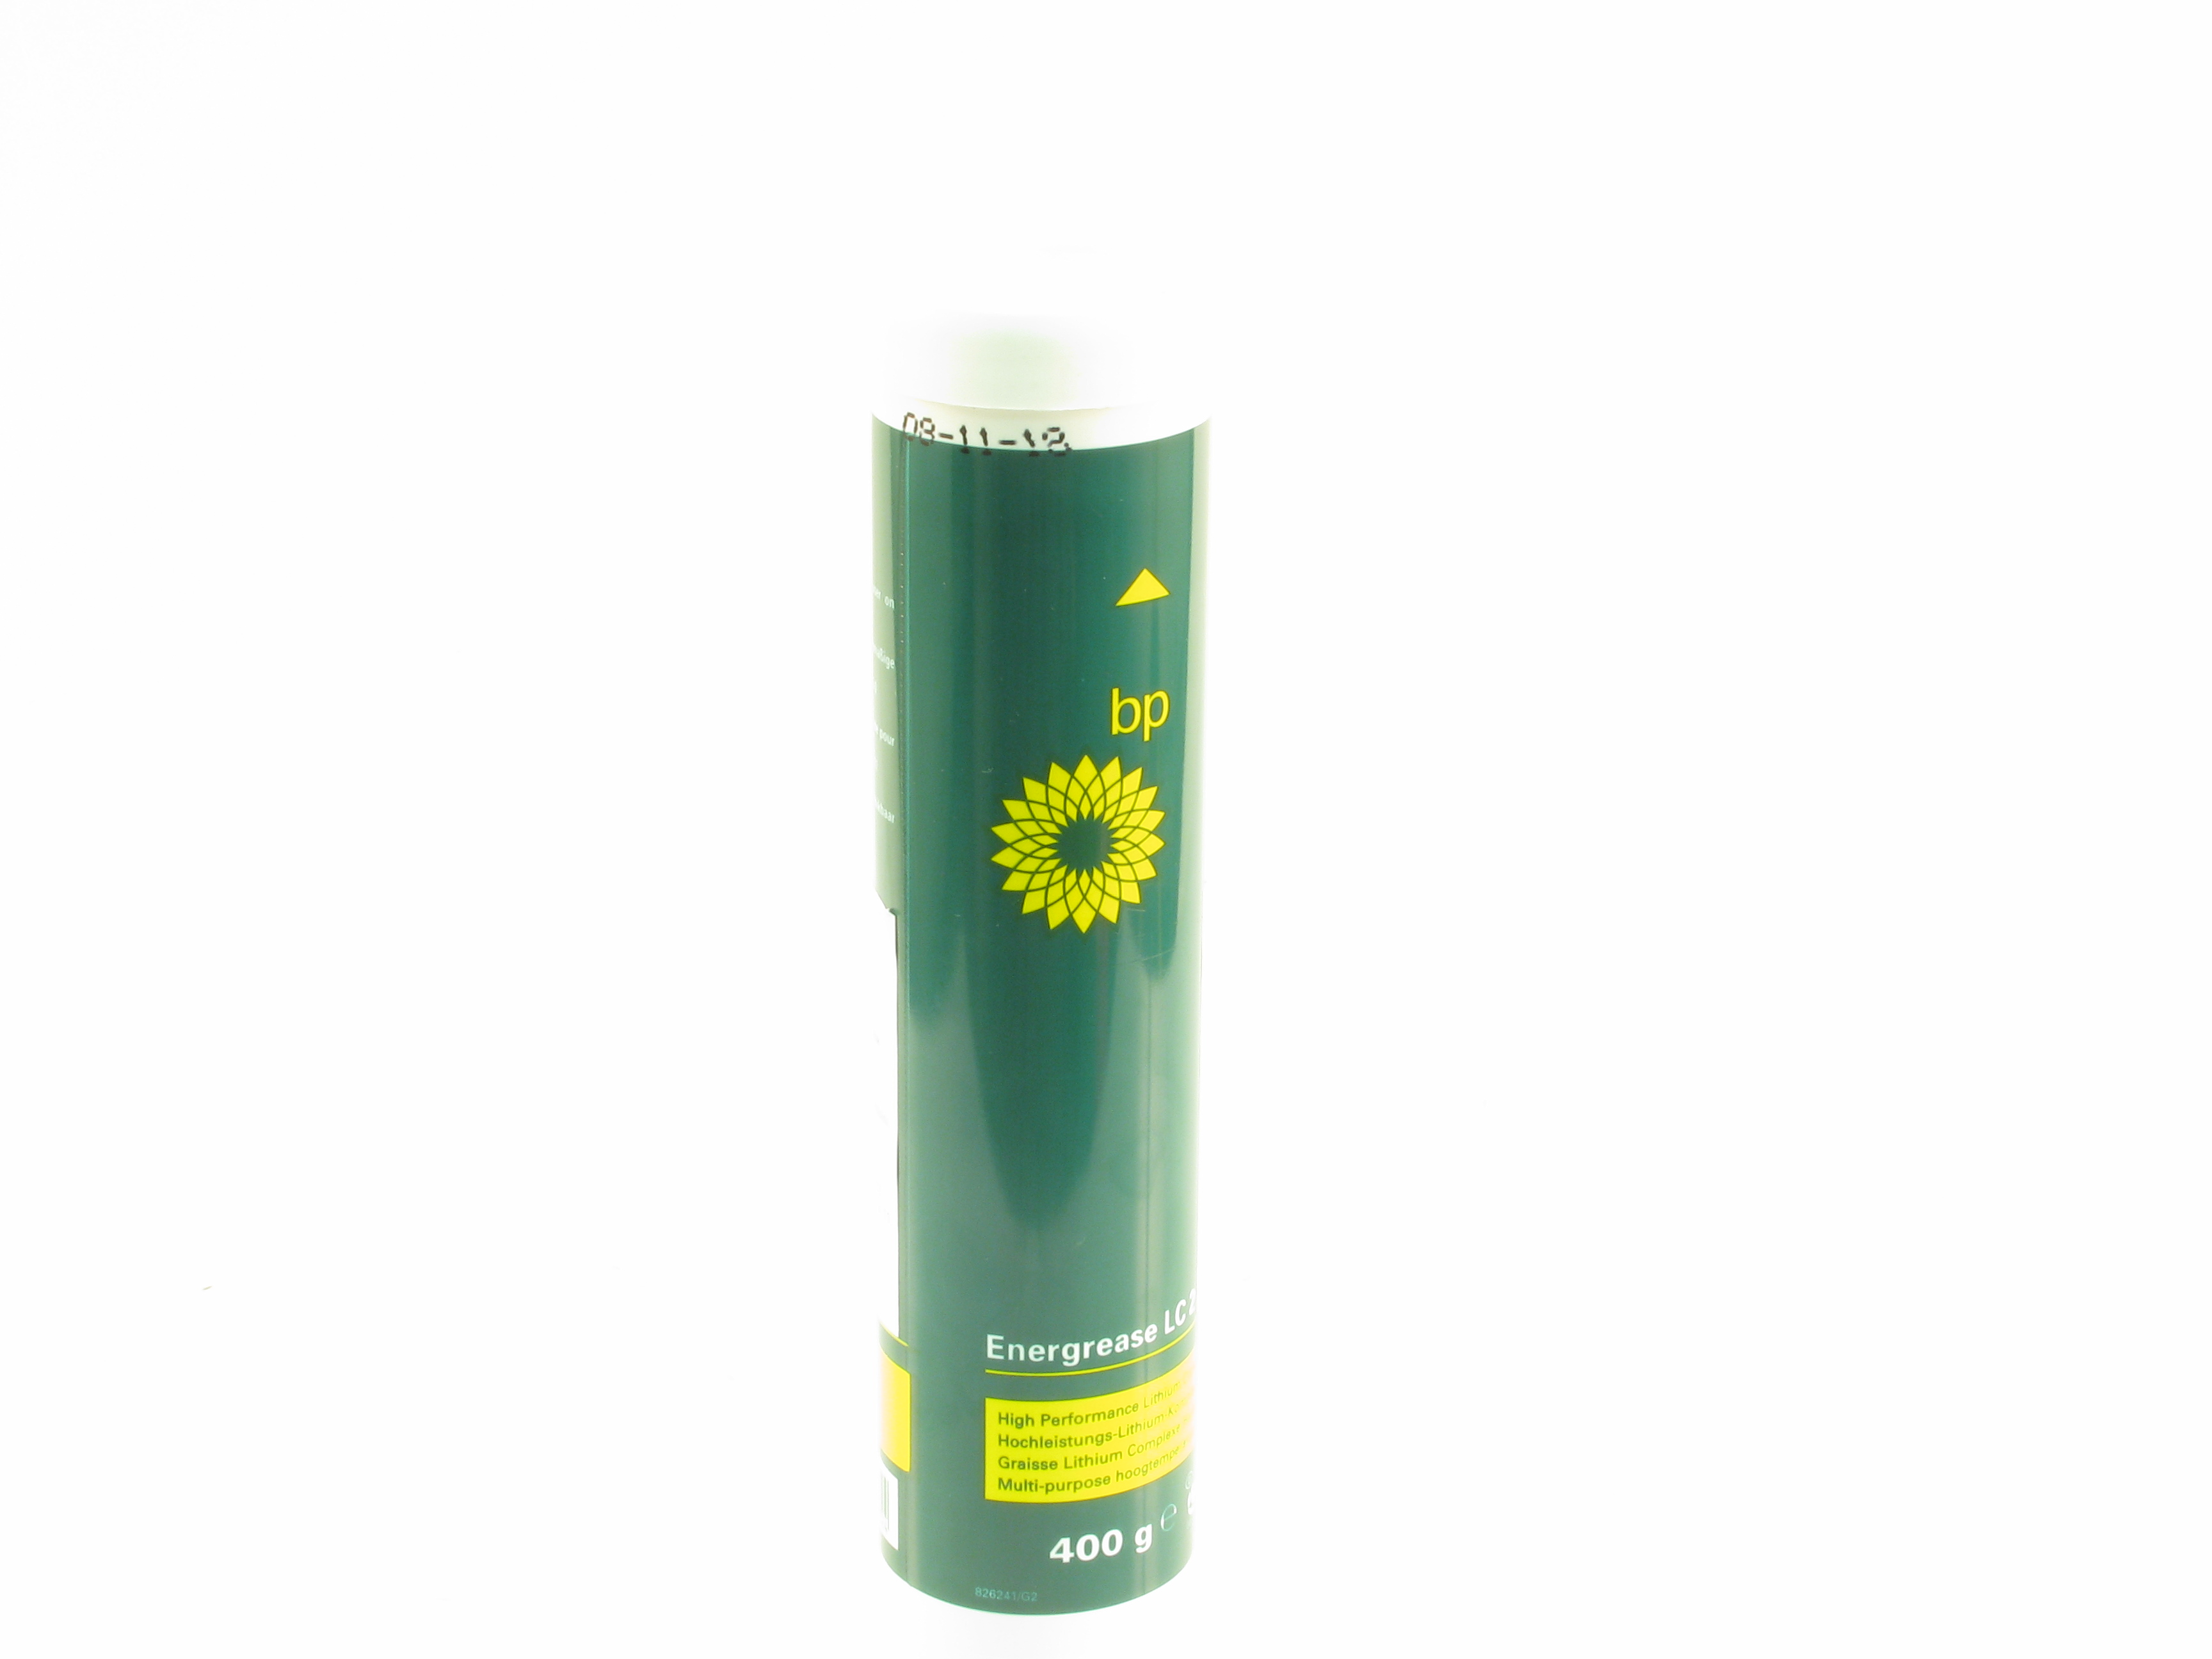 VASELINA BP ENERGREASE L21 M 400G